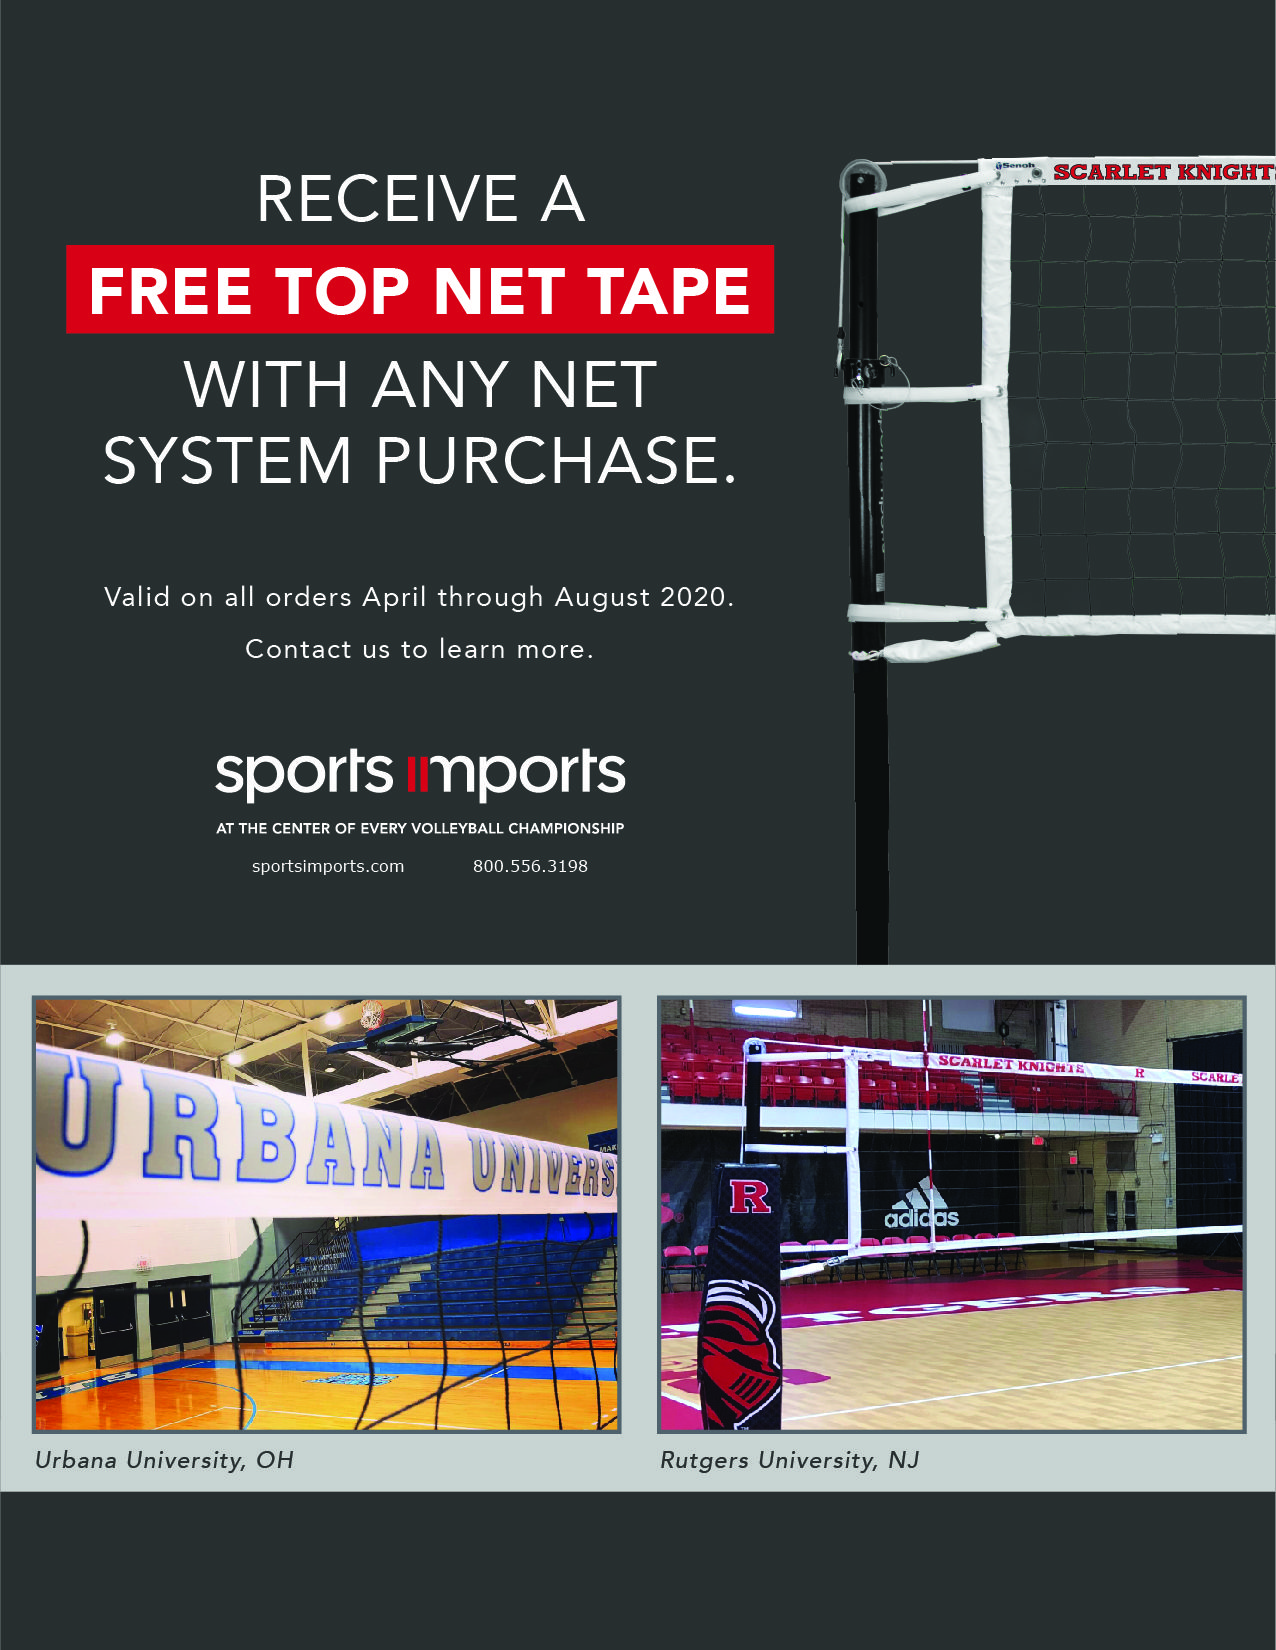 Free Custom Top Net Tape Offer In 2020 Custom Top Net Tape